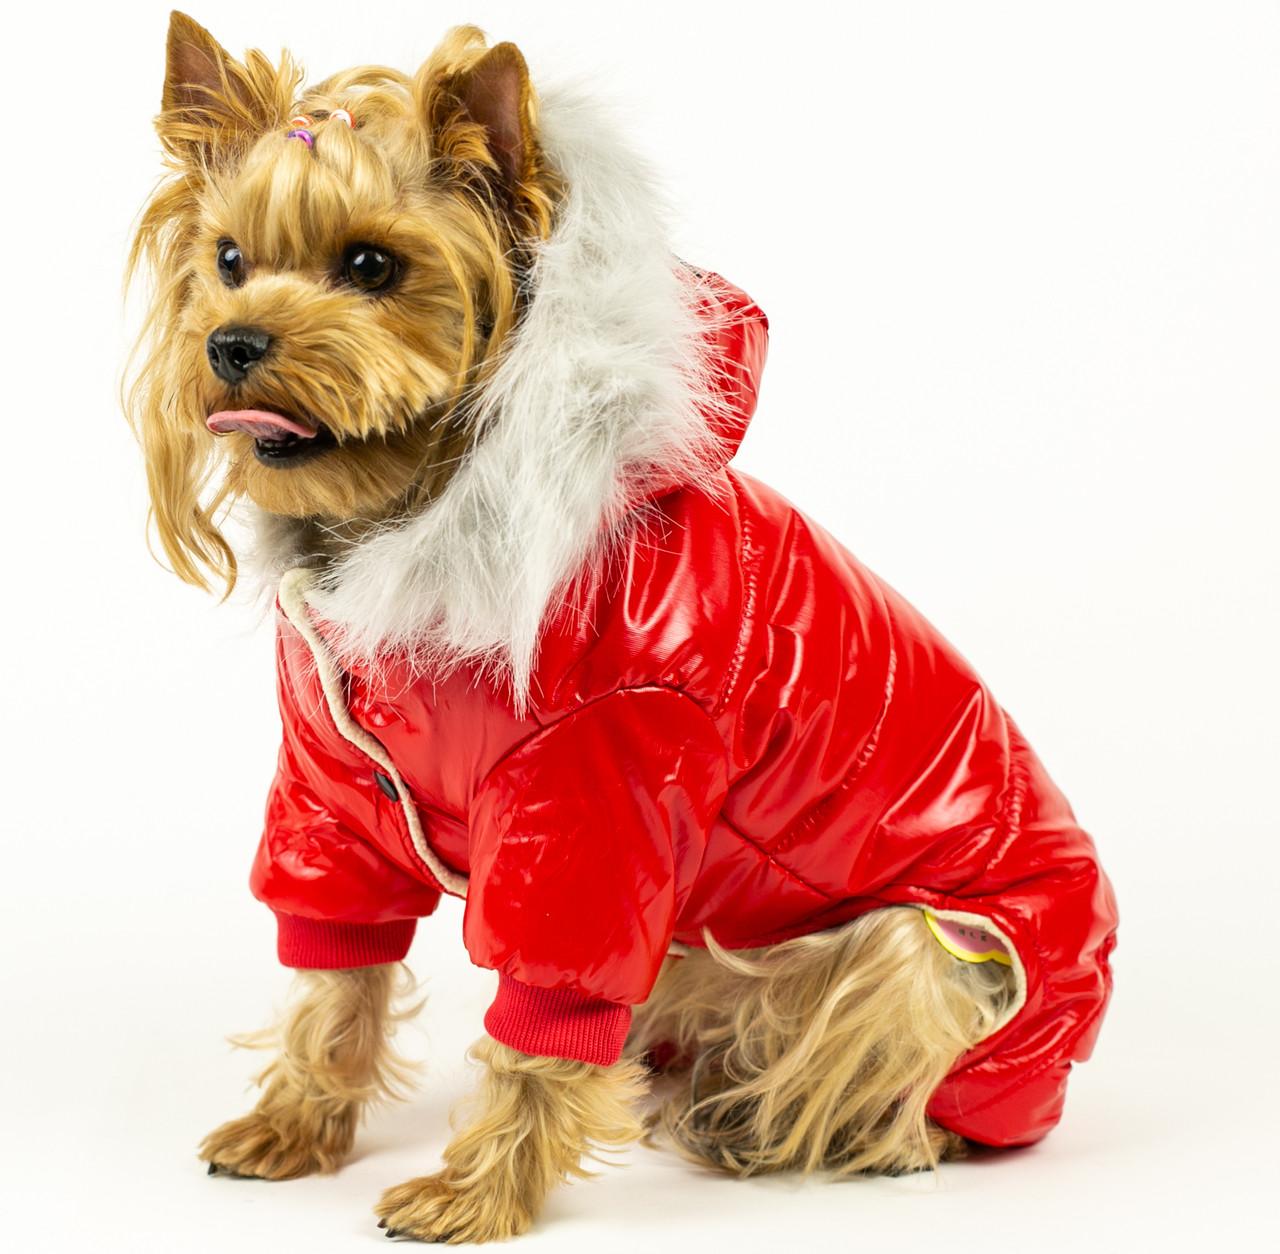 659d6b07f562 Зимний комбинезон для собак с мехом